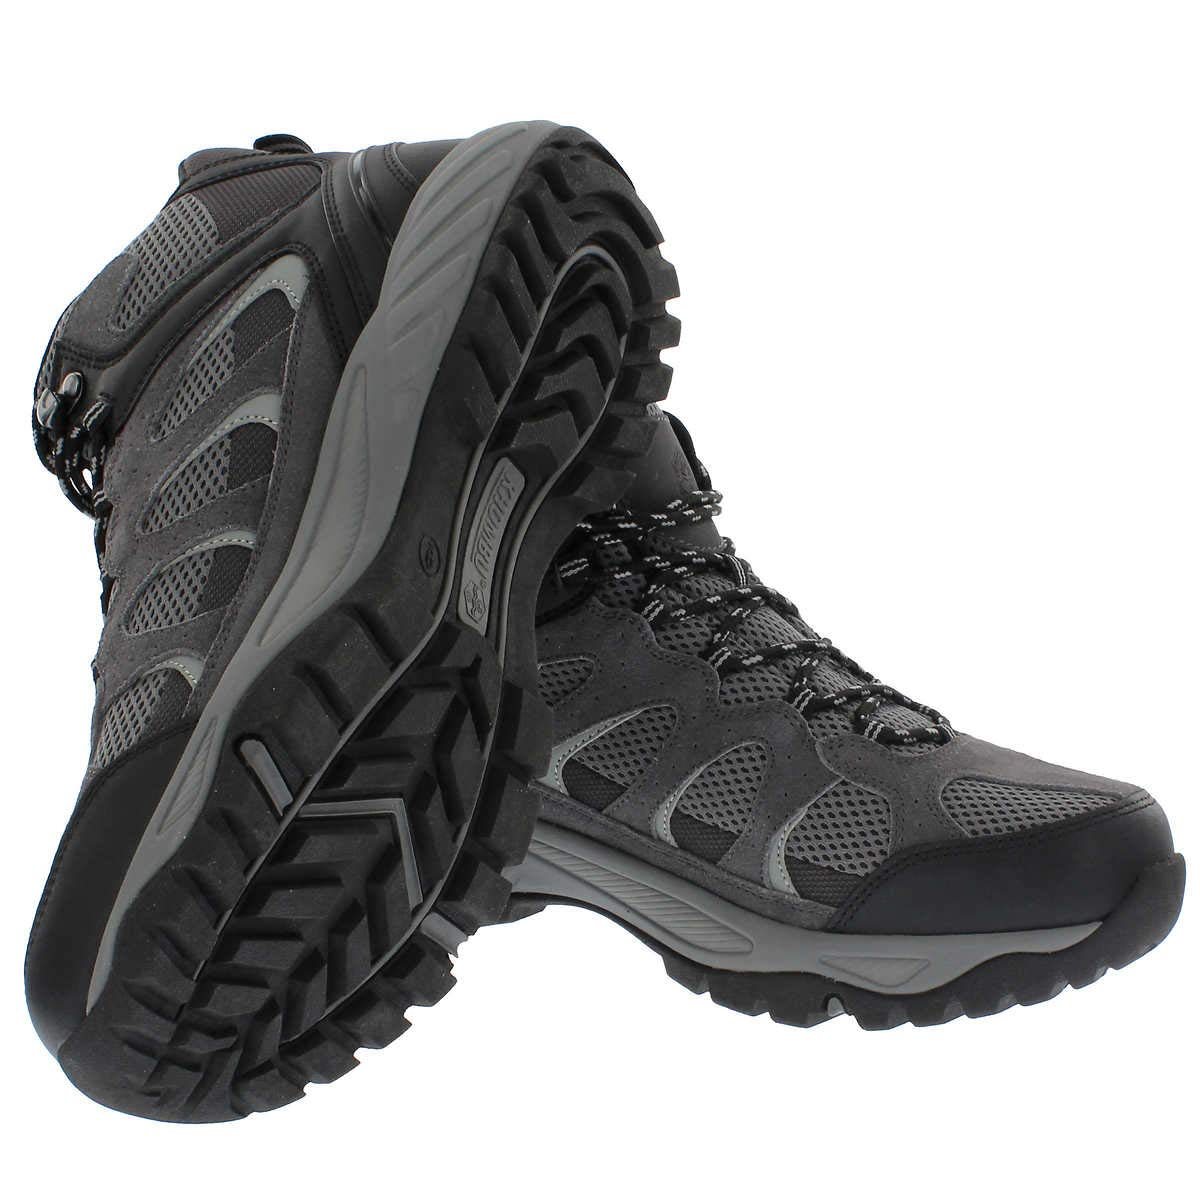 e53b316286b Khombu Tyler Men's Leather Hiking Outdoor Tactical Boots -Black/Grey